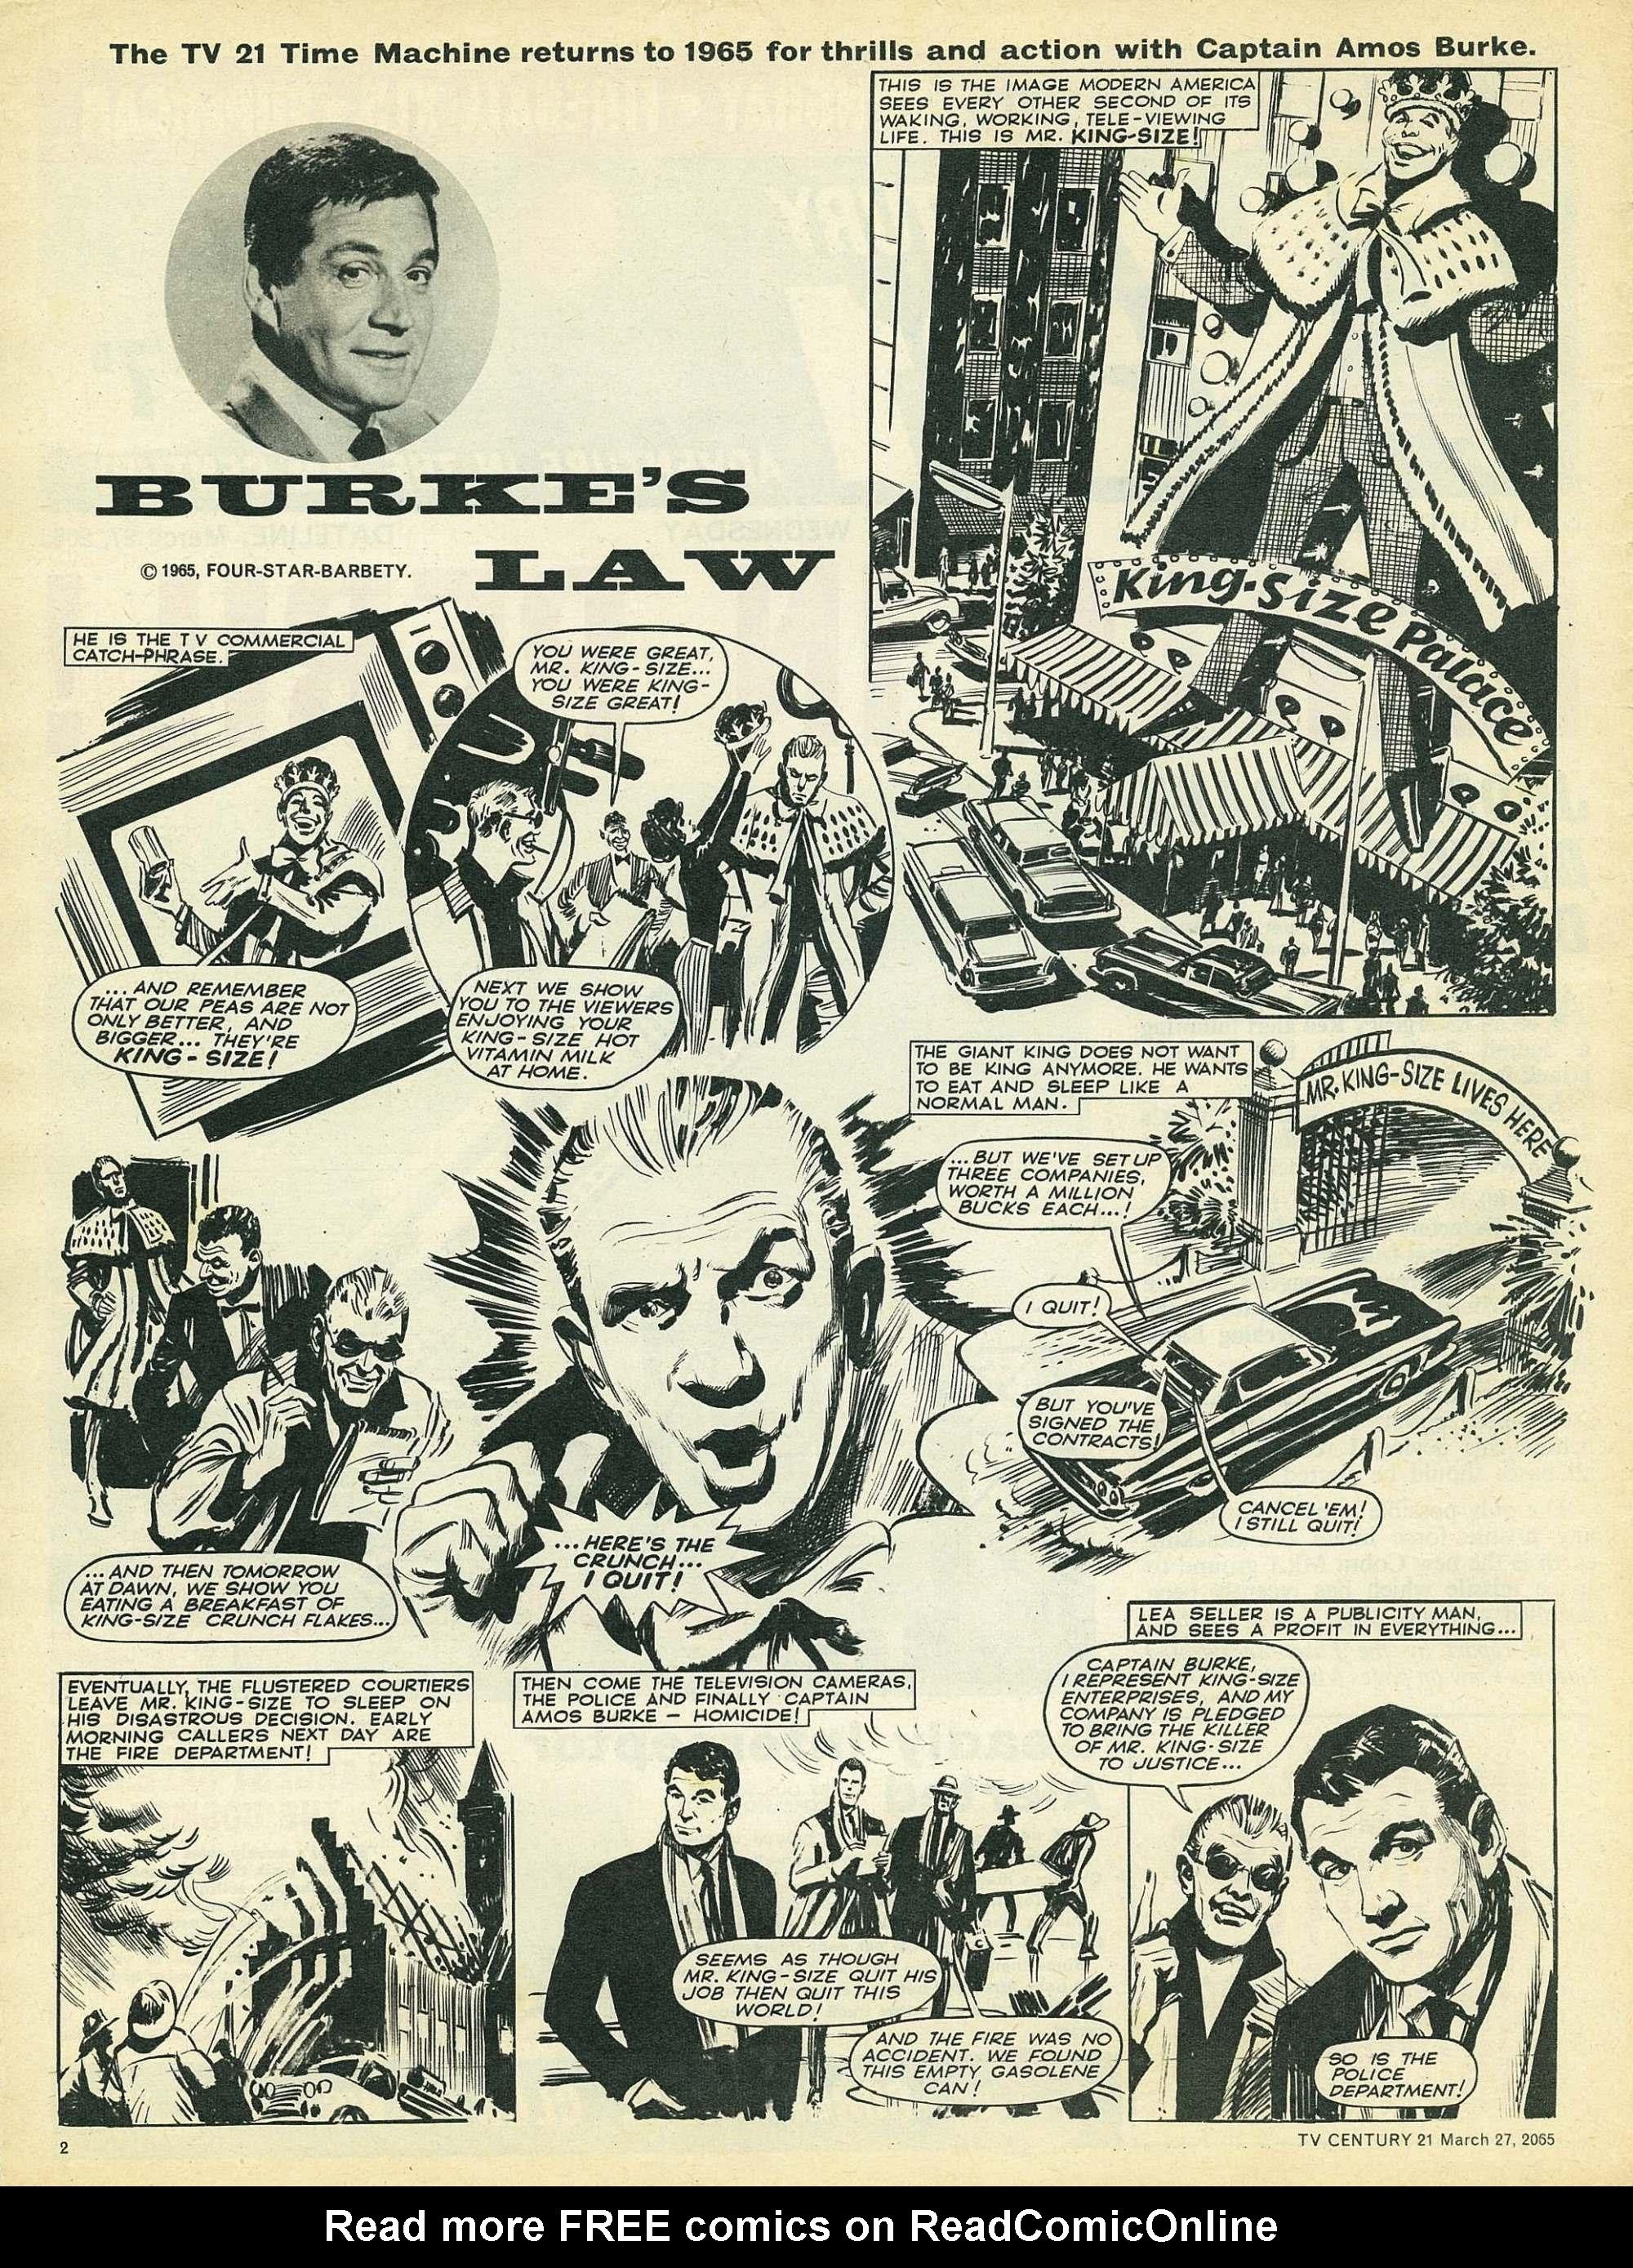 Read online TV Century 21 (TV 21) comic -  Issue #10 - 2